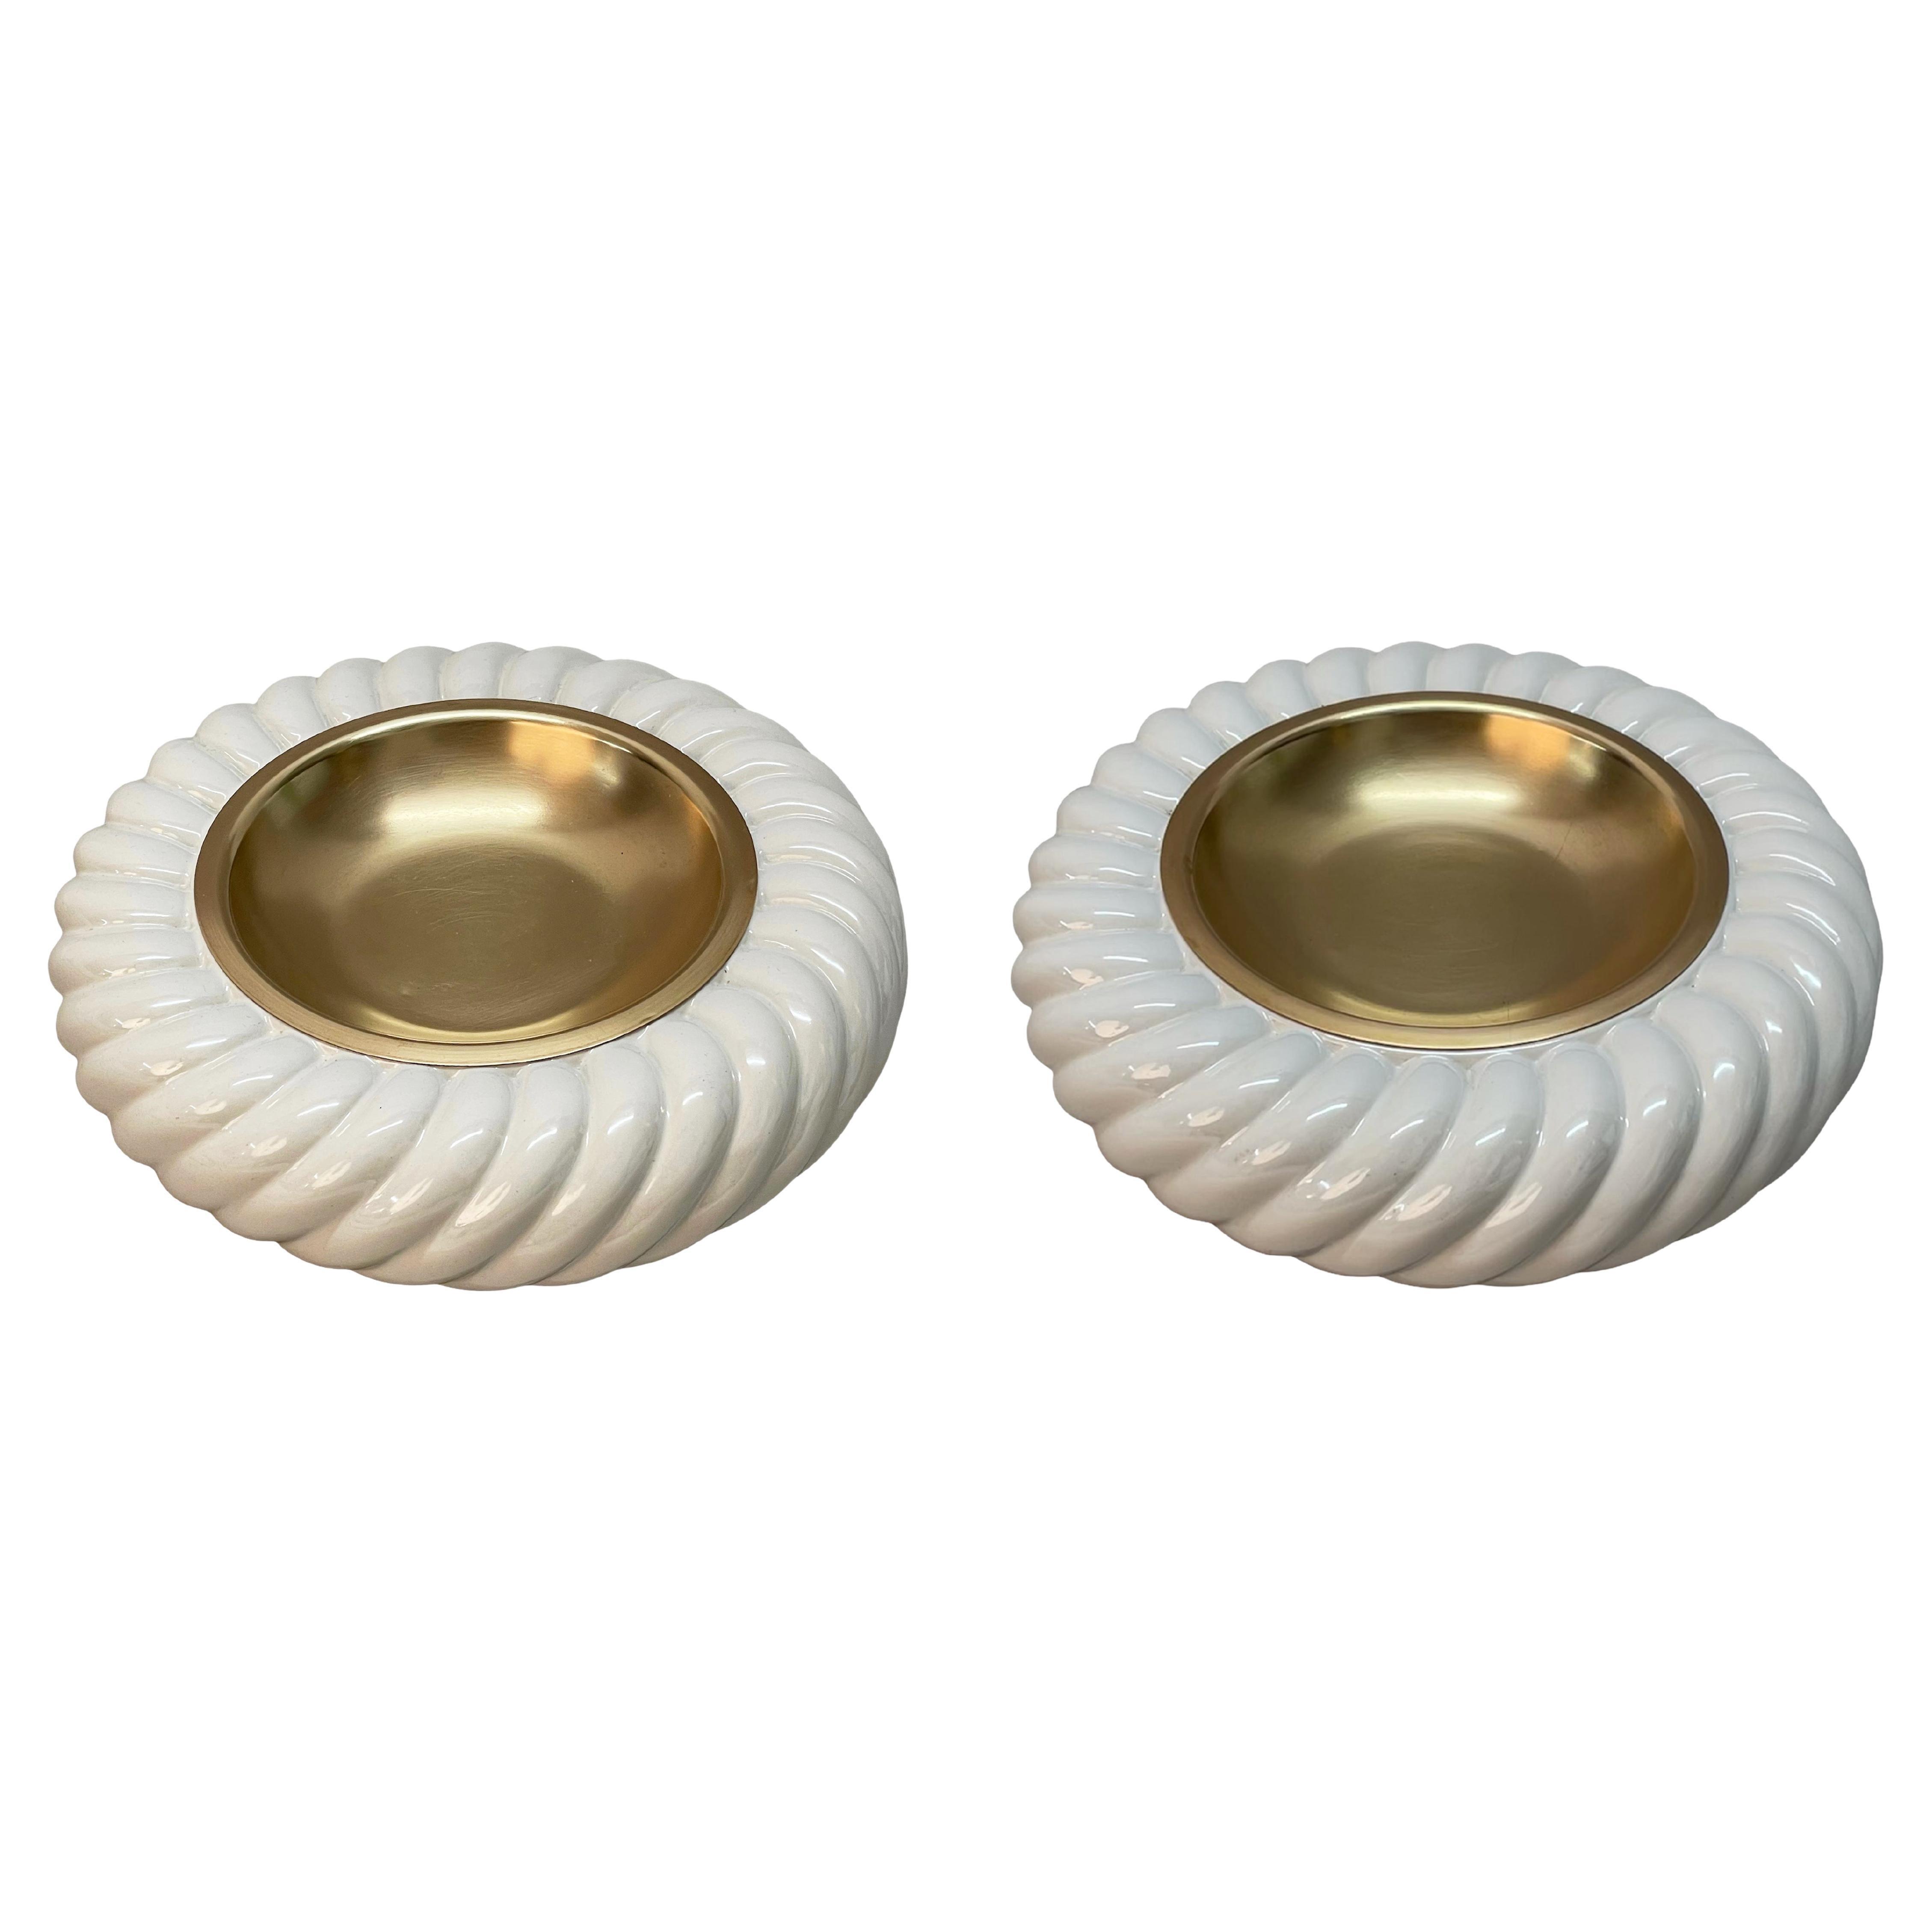 Pair of Tommaso Barbi Midcentury White Ceramic and Brass Italian Ashtrays, 1960s